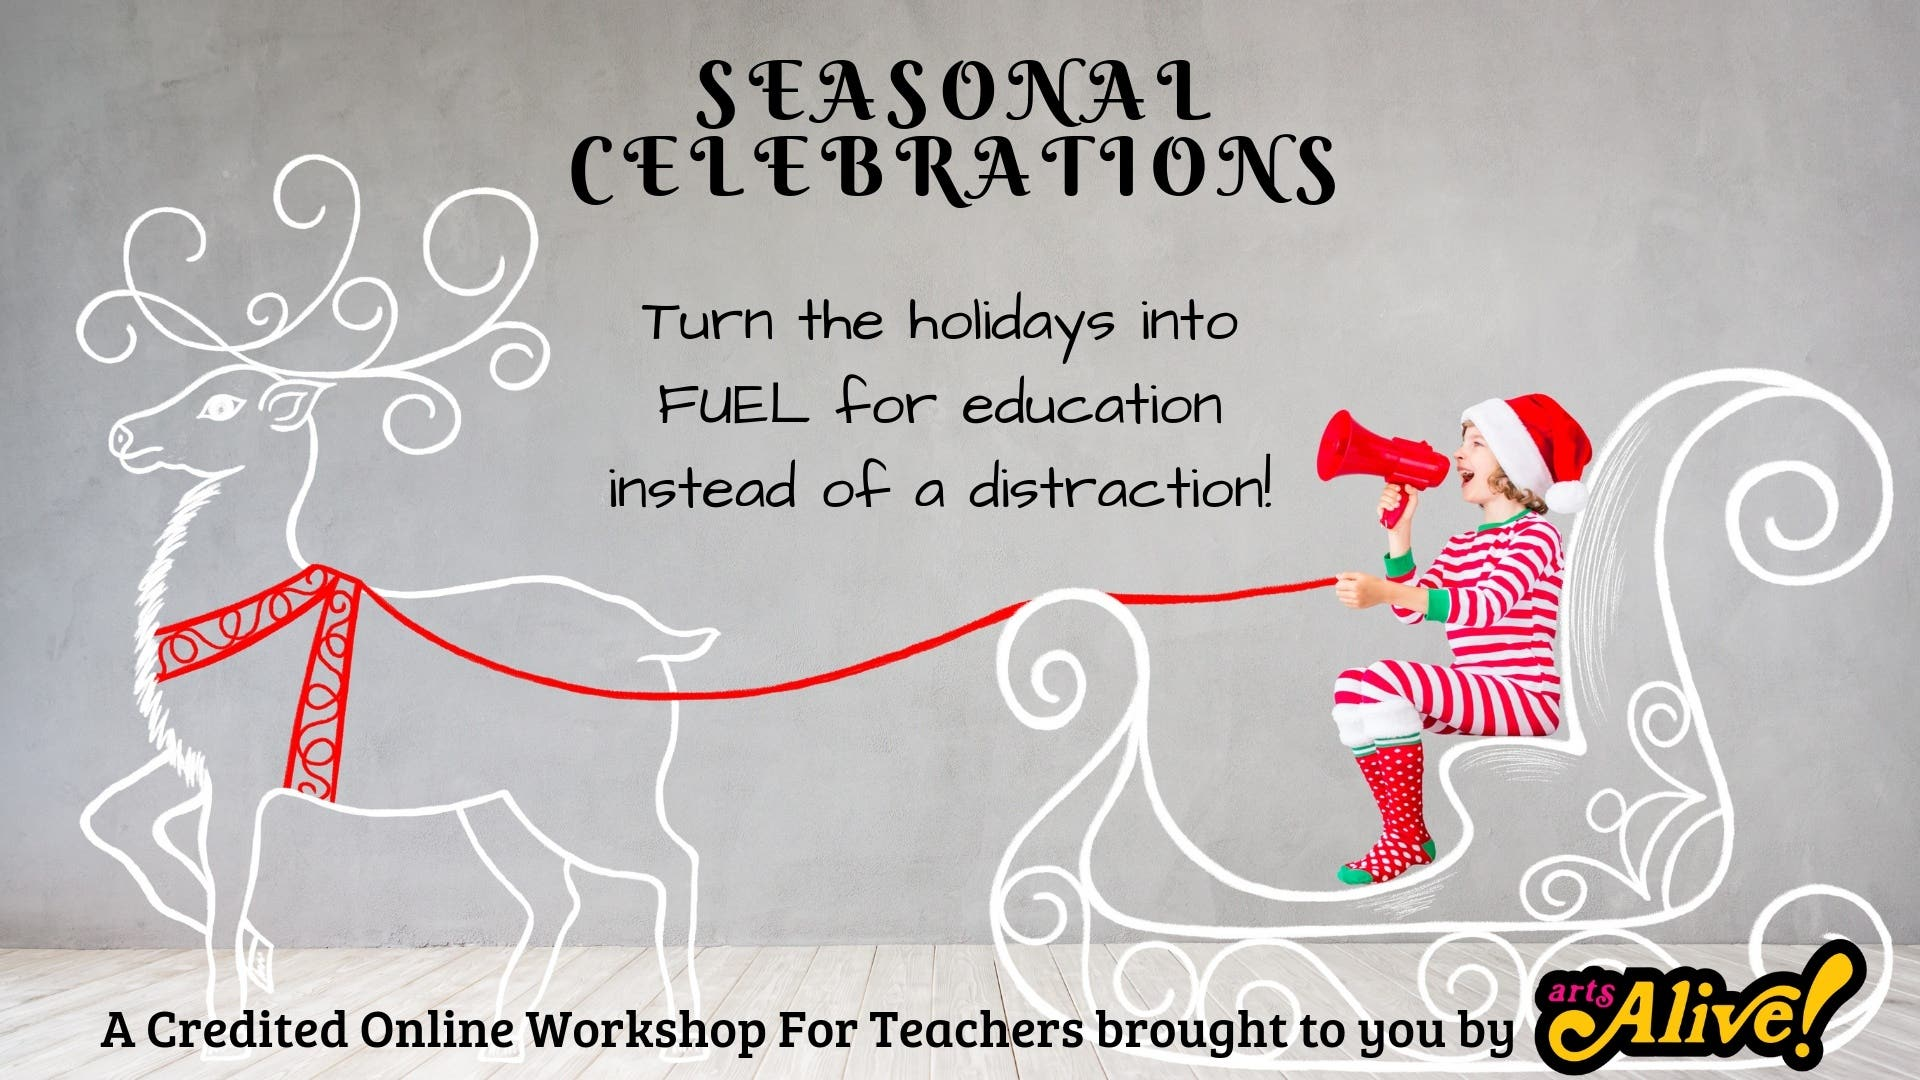 Seasonal Celebrations, 1 hour of CPE credit